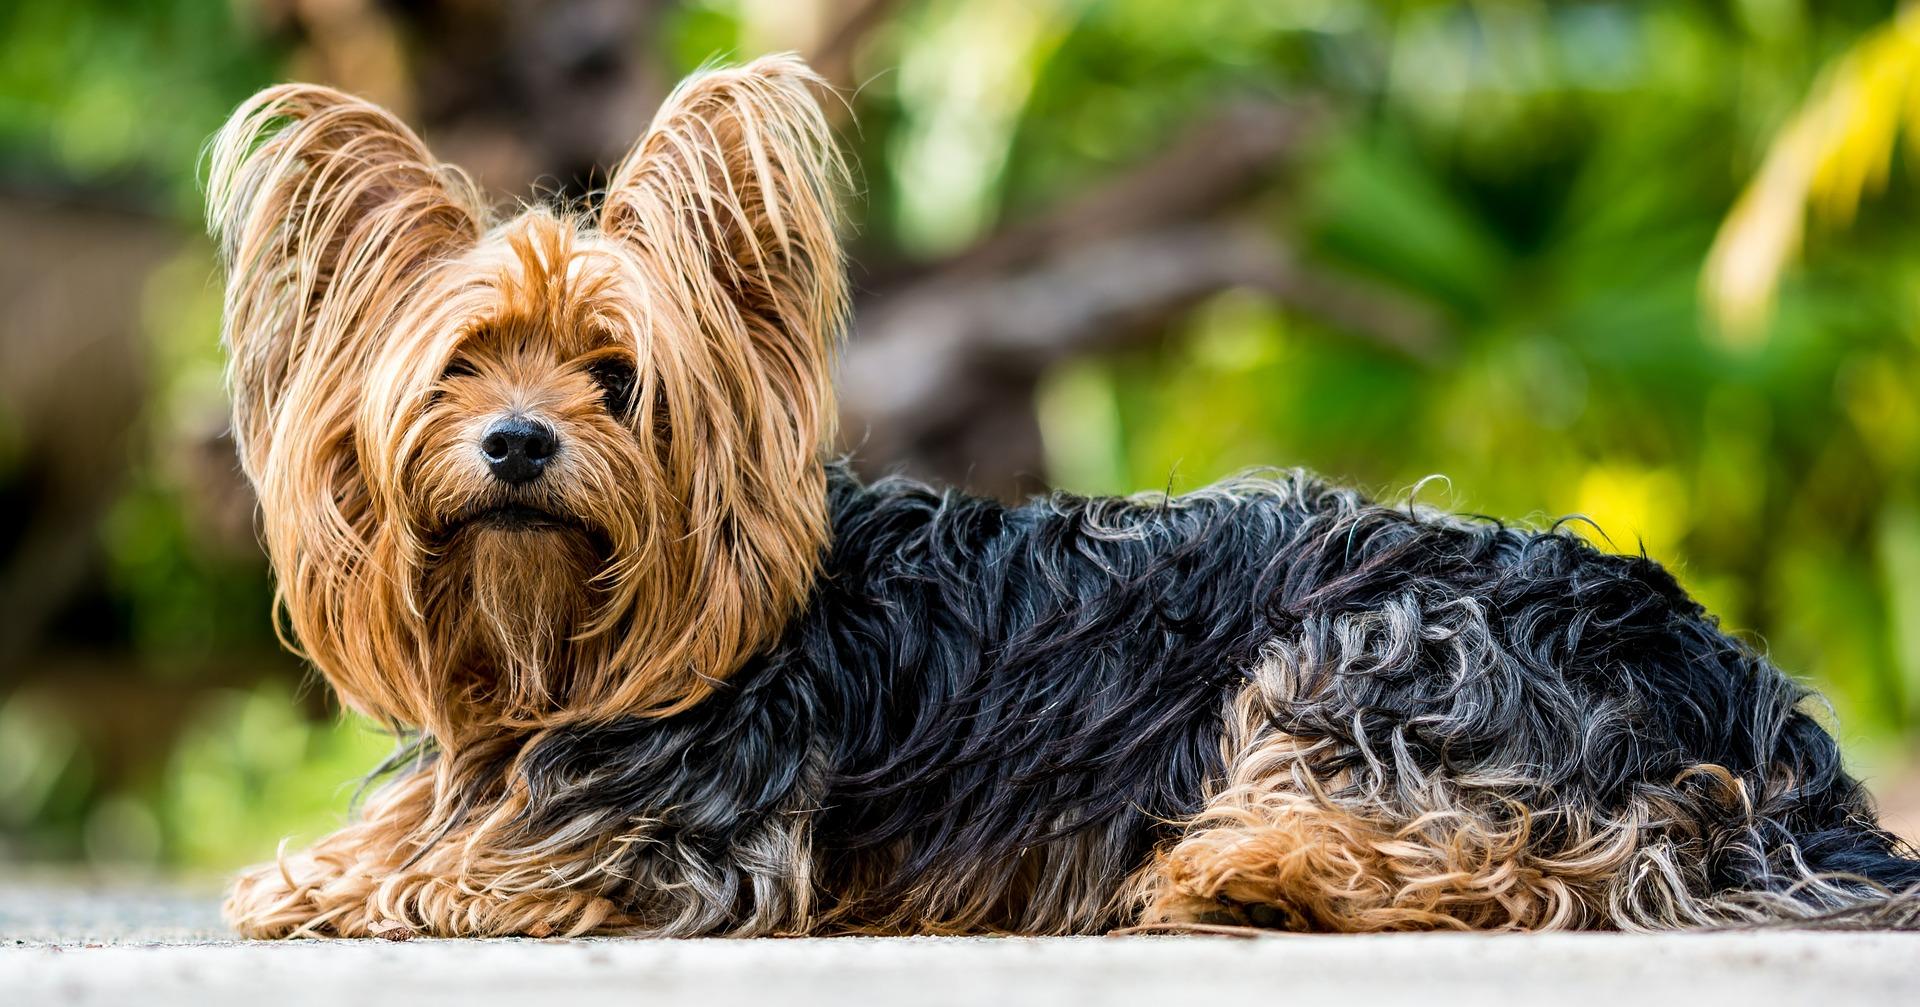 yorkshire-terrier-361730_1920